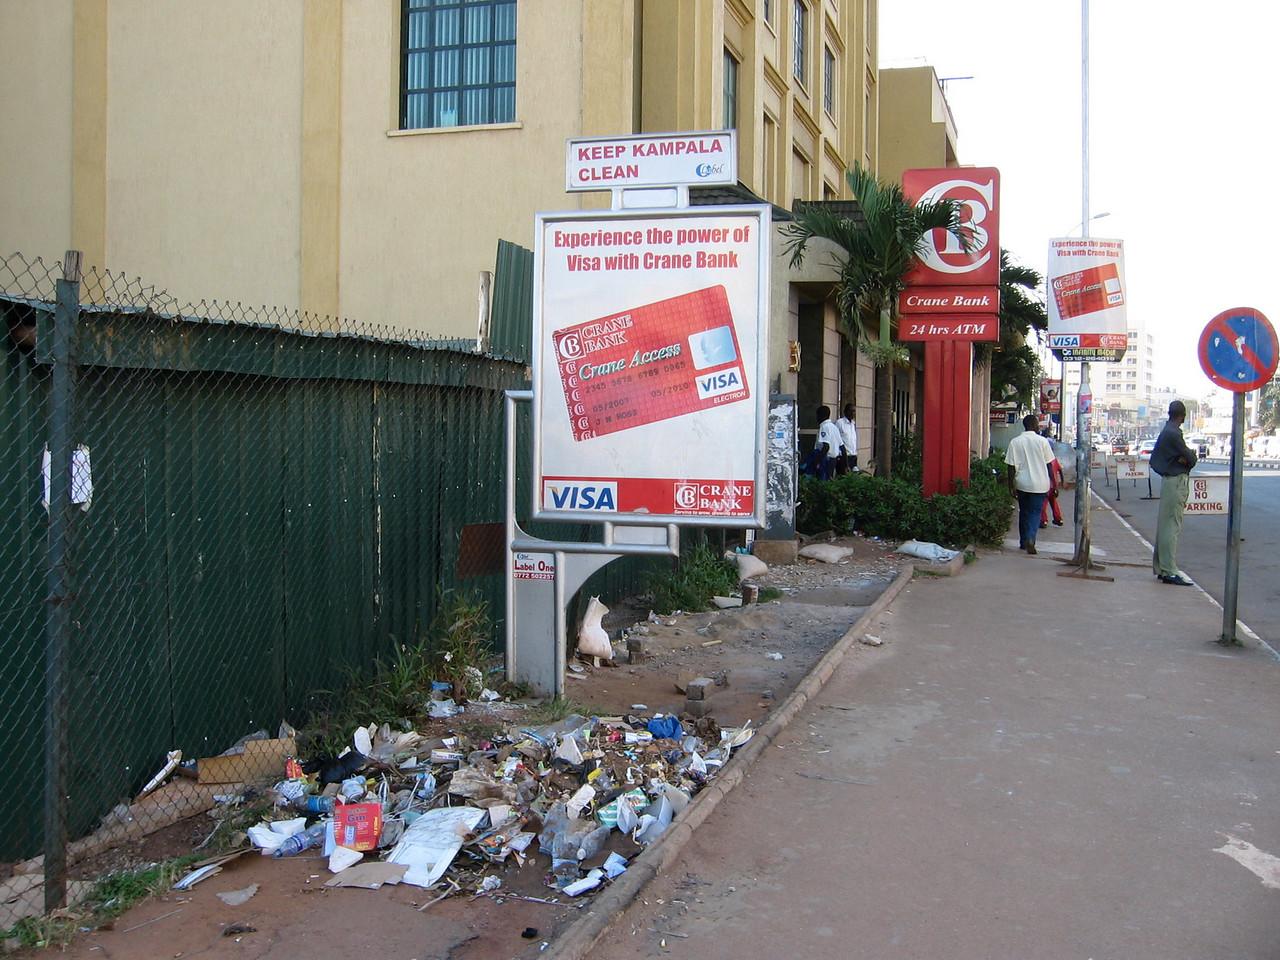 Keep Kampala clean!